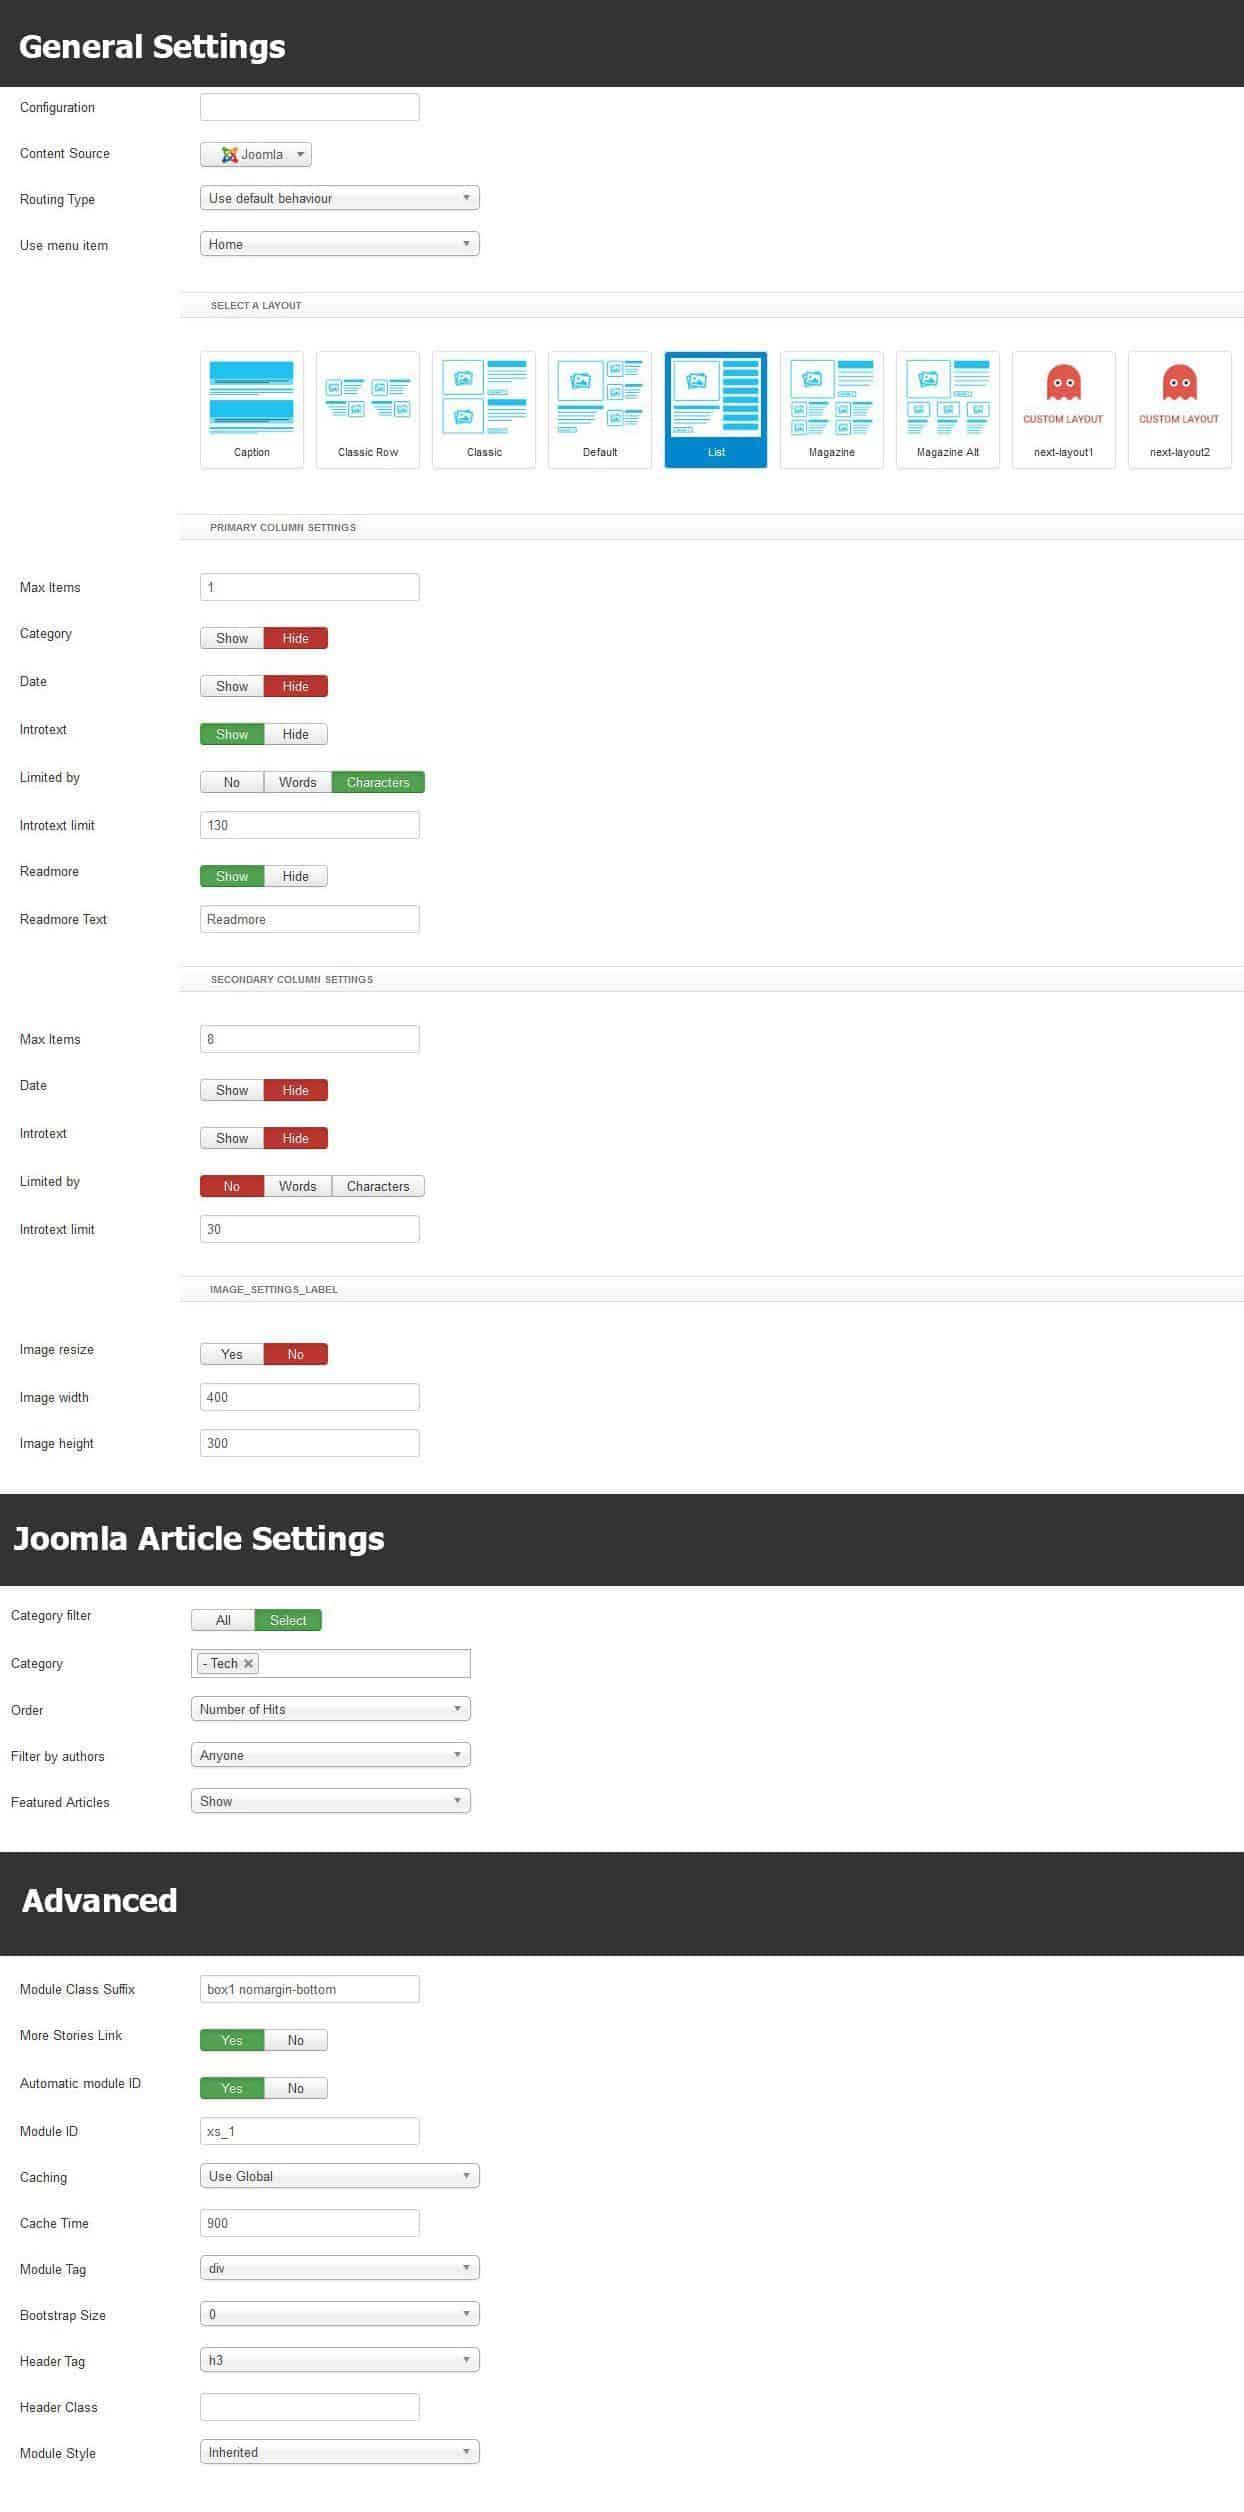 Tech News Module settings